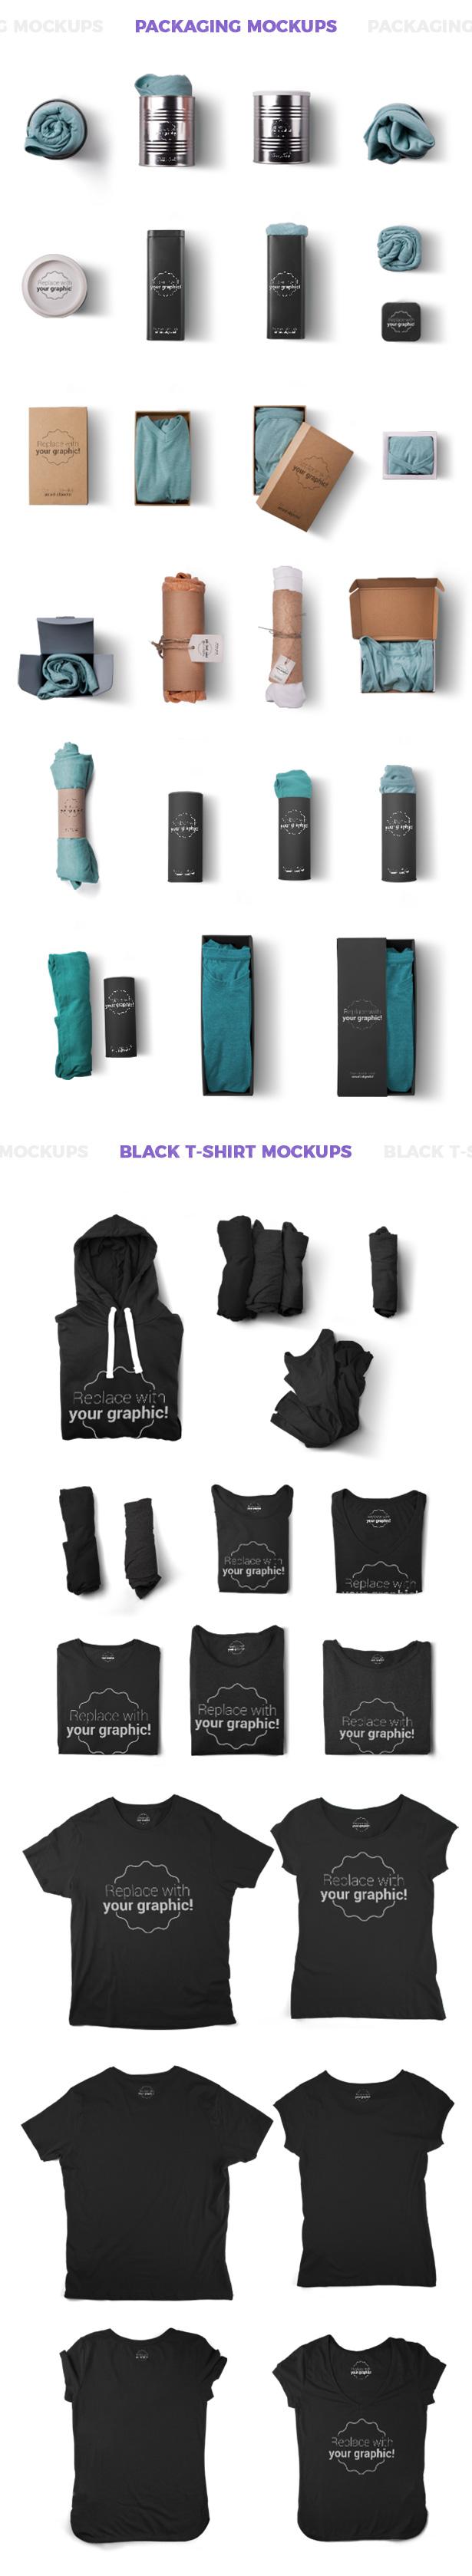 T shirt mockups and packages hero images scene generator for Mockup generator t shirt